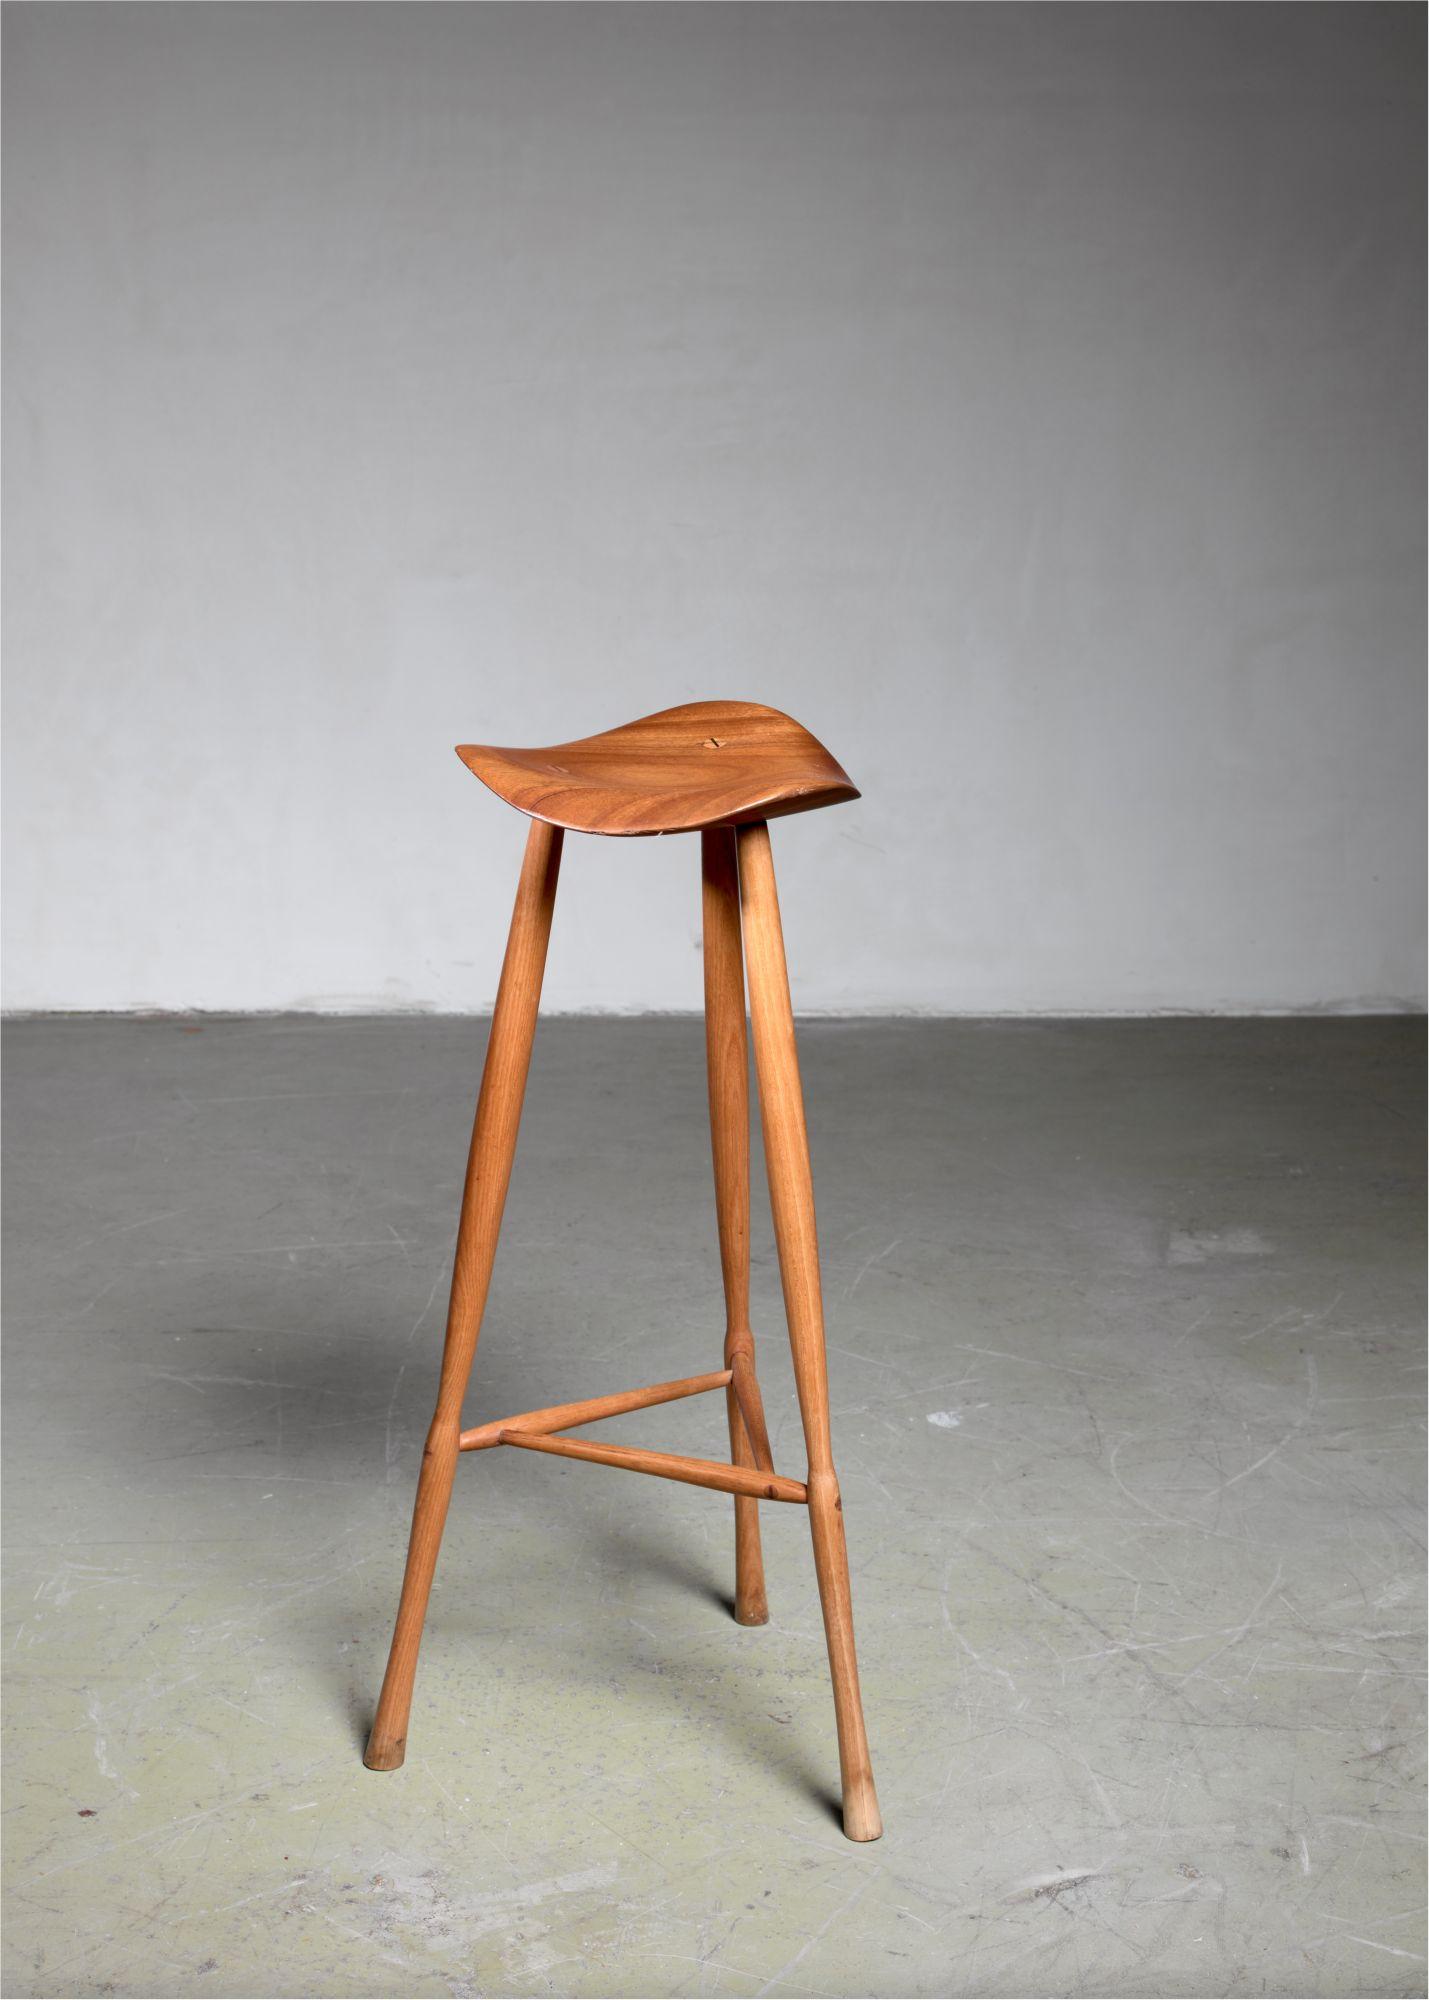 Remarkable Karl Seemuller Studio Craft Teak Stool Usa 1973 Beatyapartments Chair Design Images Beatyapartmentscom